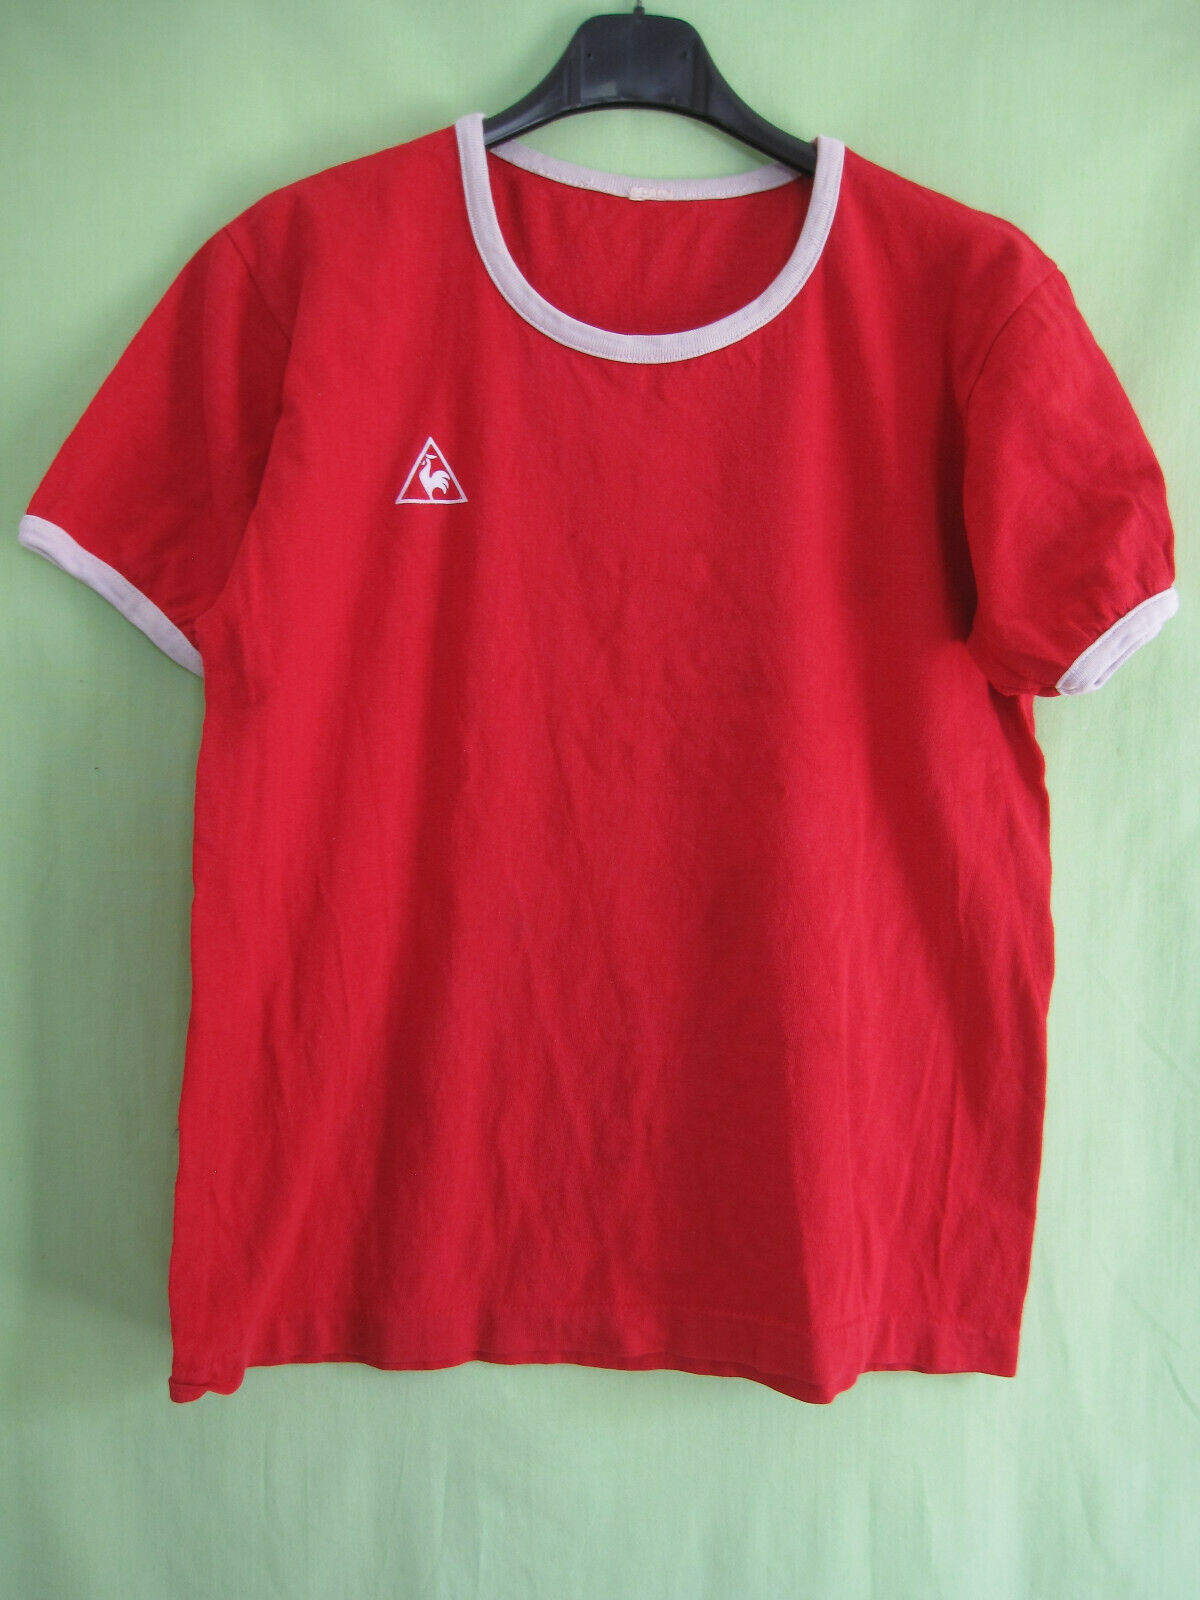 Maillot Le Coq Sportif Vintage red 70'S Coton Nimes Olympique Shirt - M